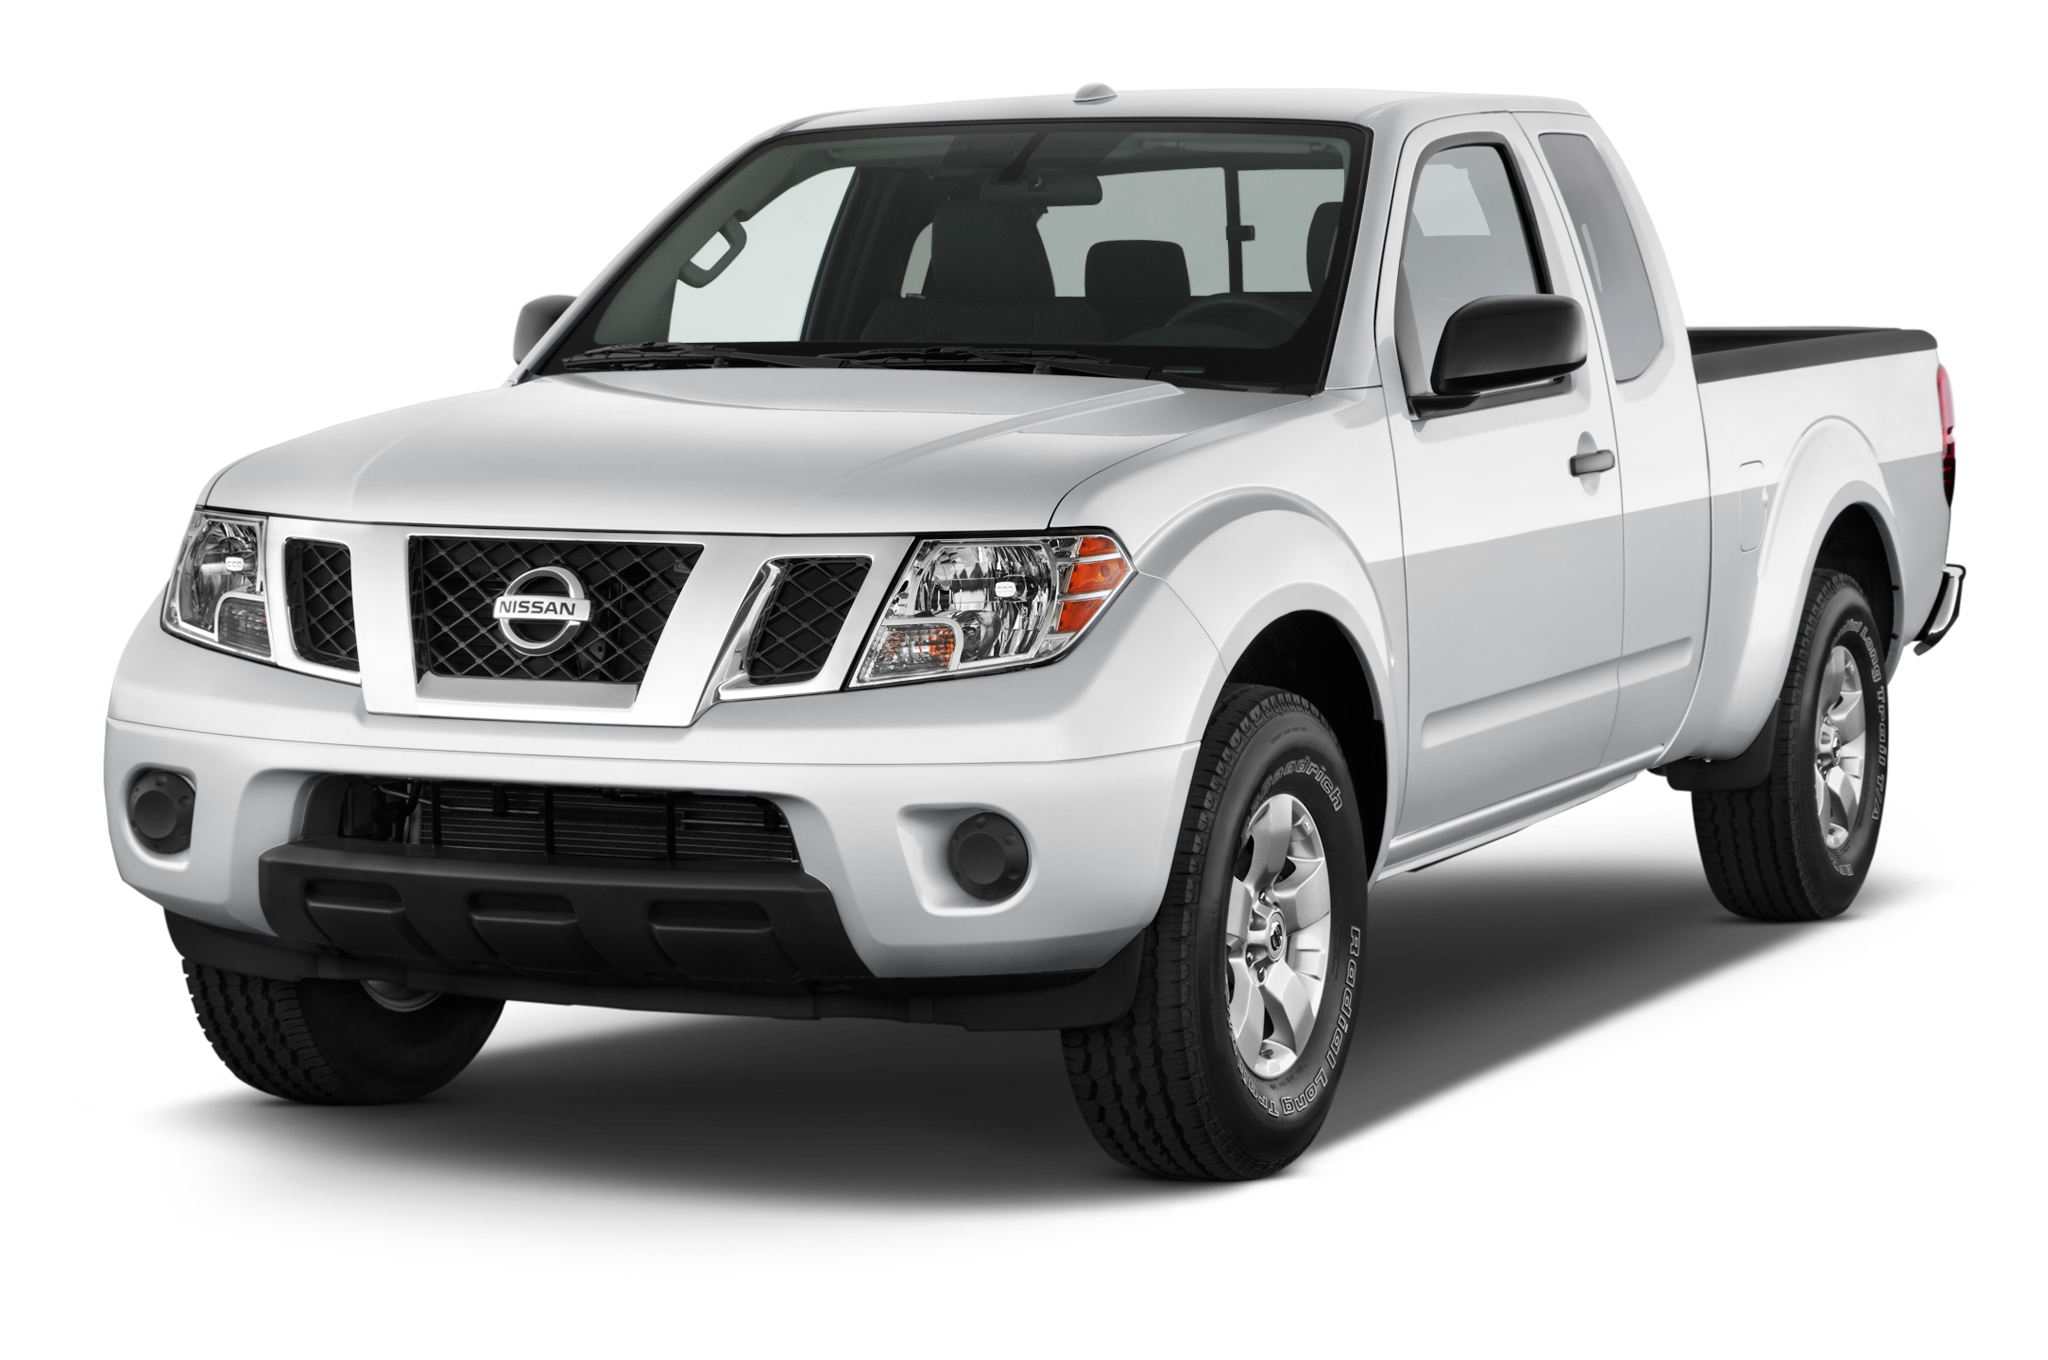 Nissan Frontier Next Generation >> Next-Generation Nissan Pickup Teased - Automobile Magazine